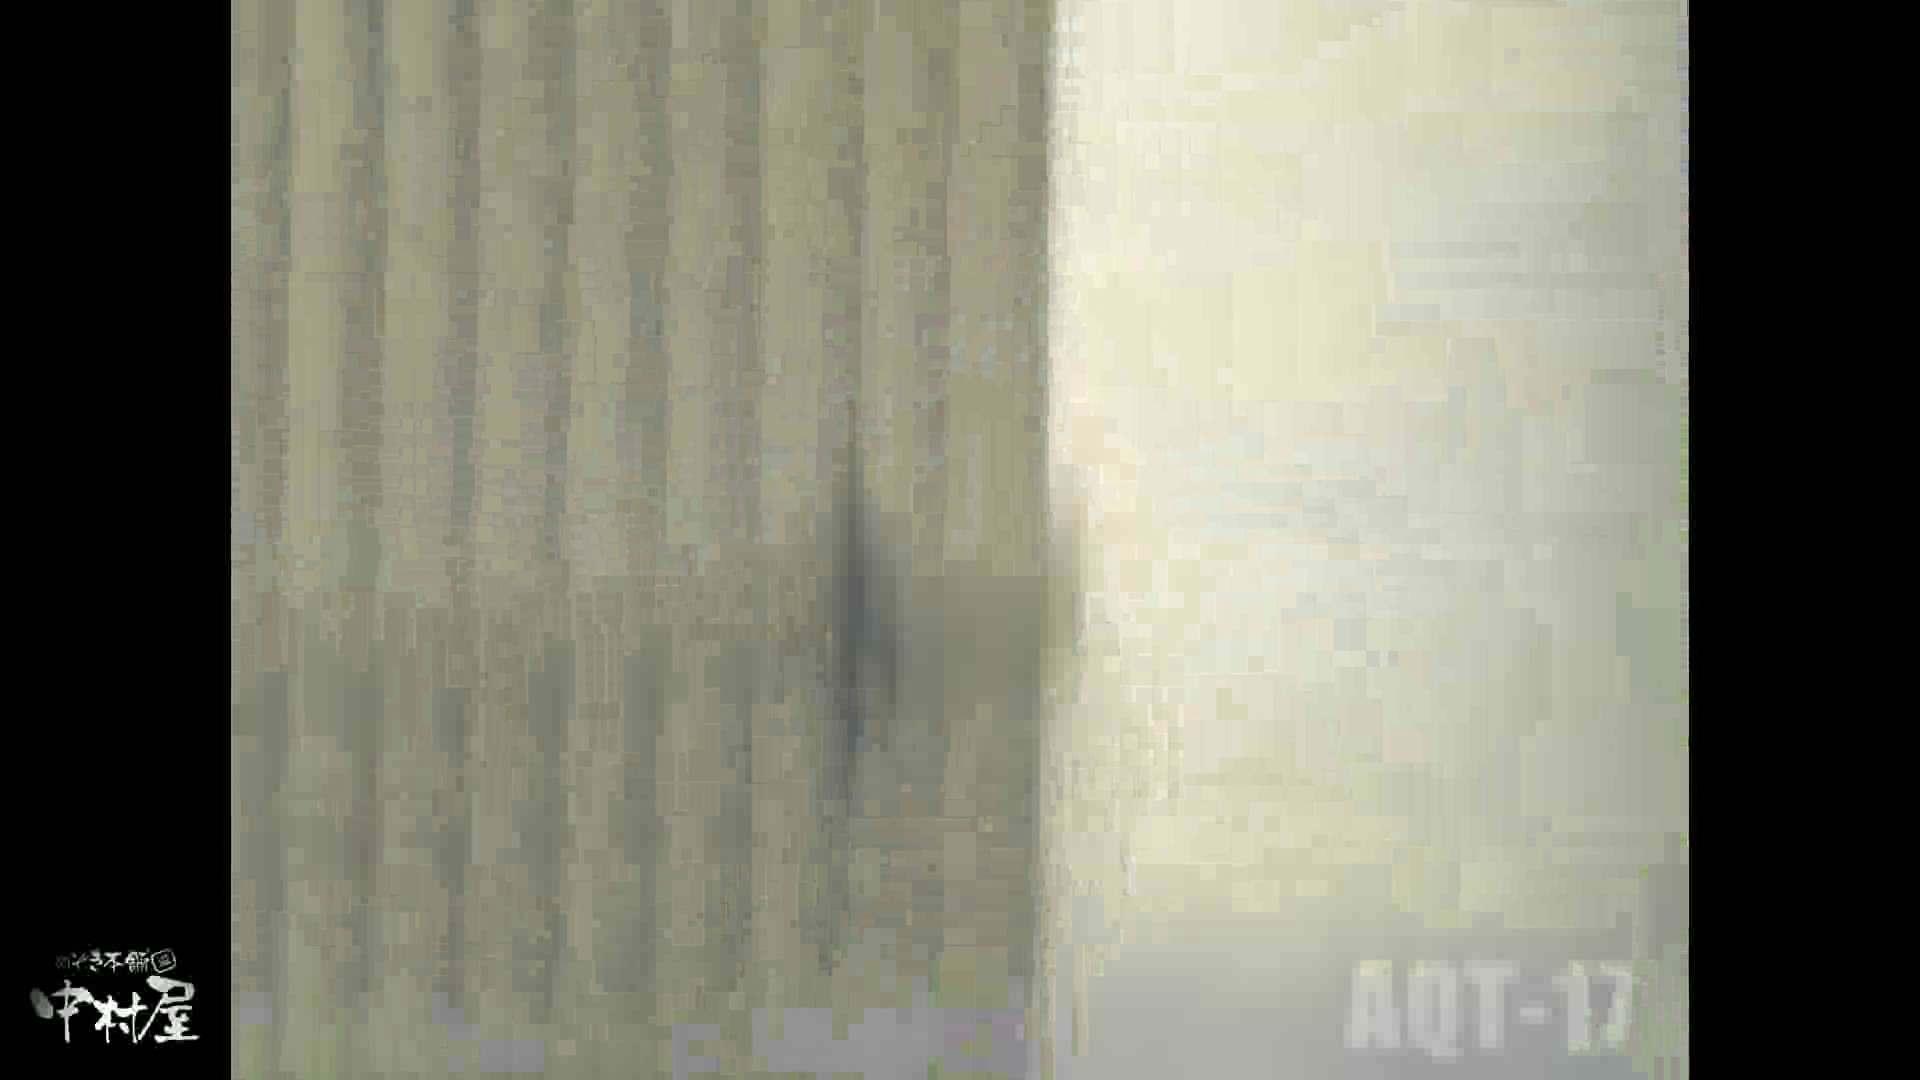 Aquaな露天風呂Vol.881潜入盗撮露天風呂十七判湯 其の五 美しいOLの裸体 オマンコ無修正動画無料 102pic 86